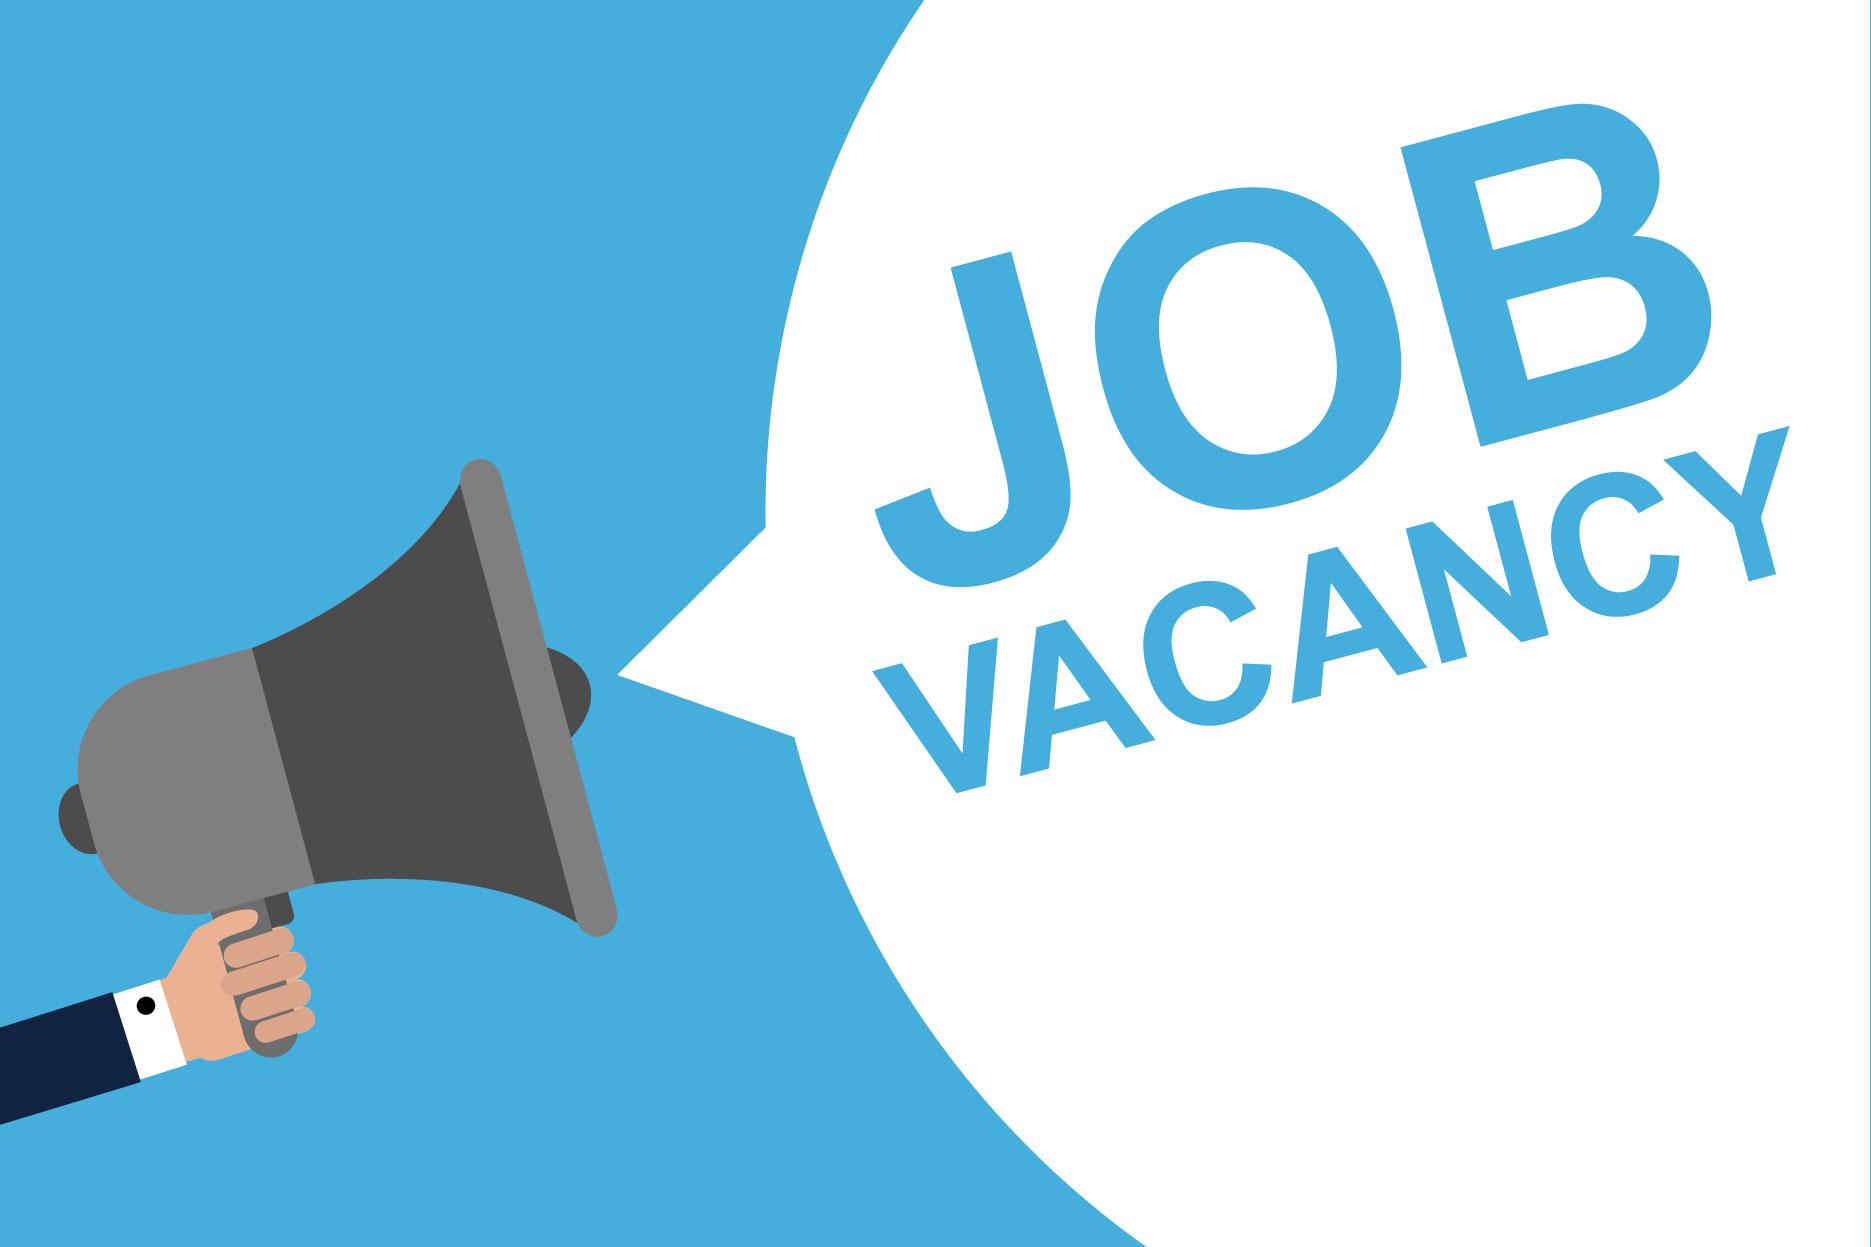 We are hiring! | European Vocational Training Association - EVTA